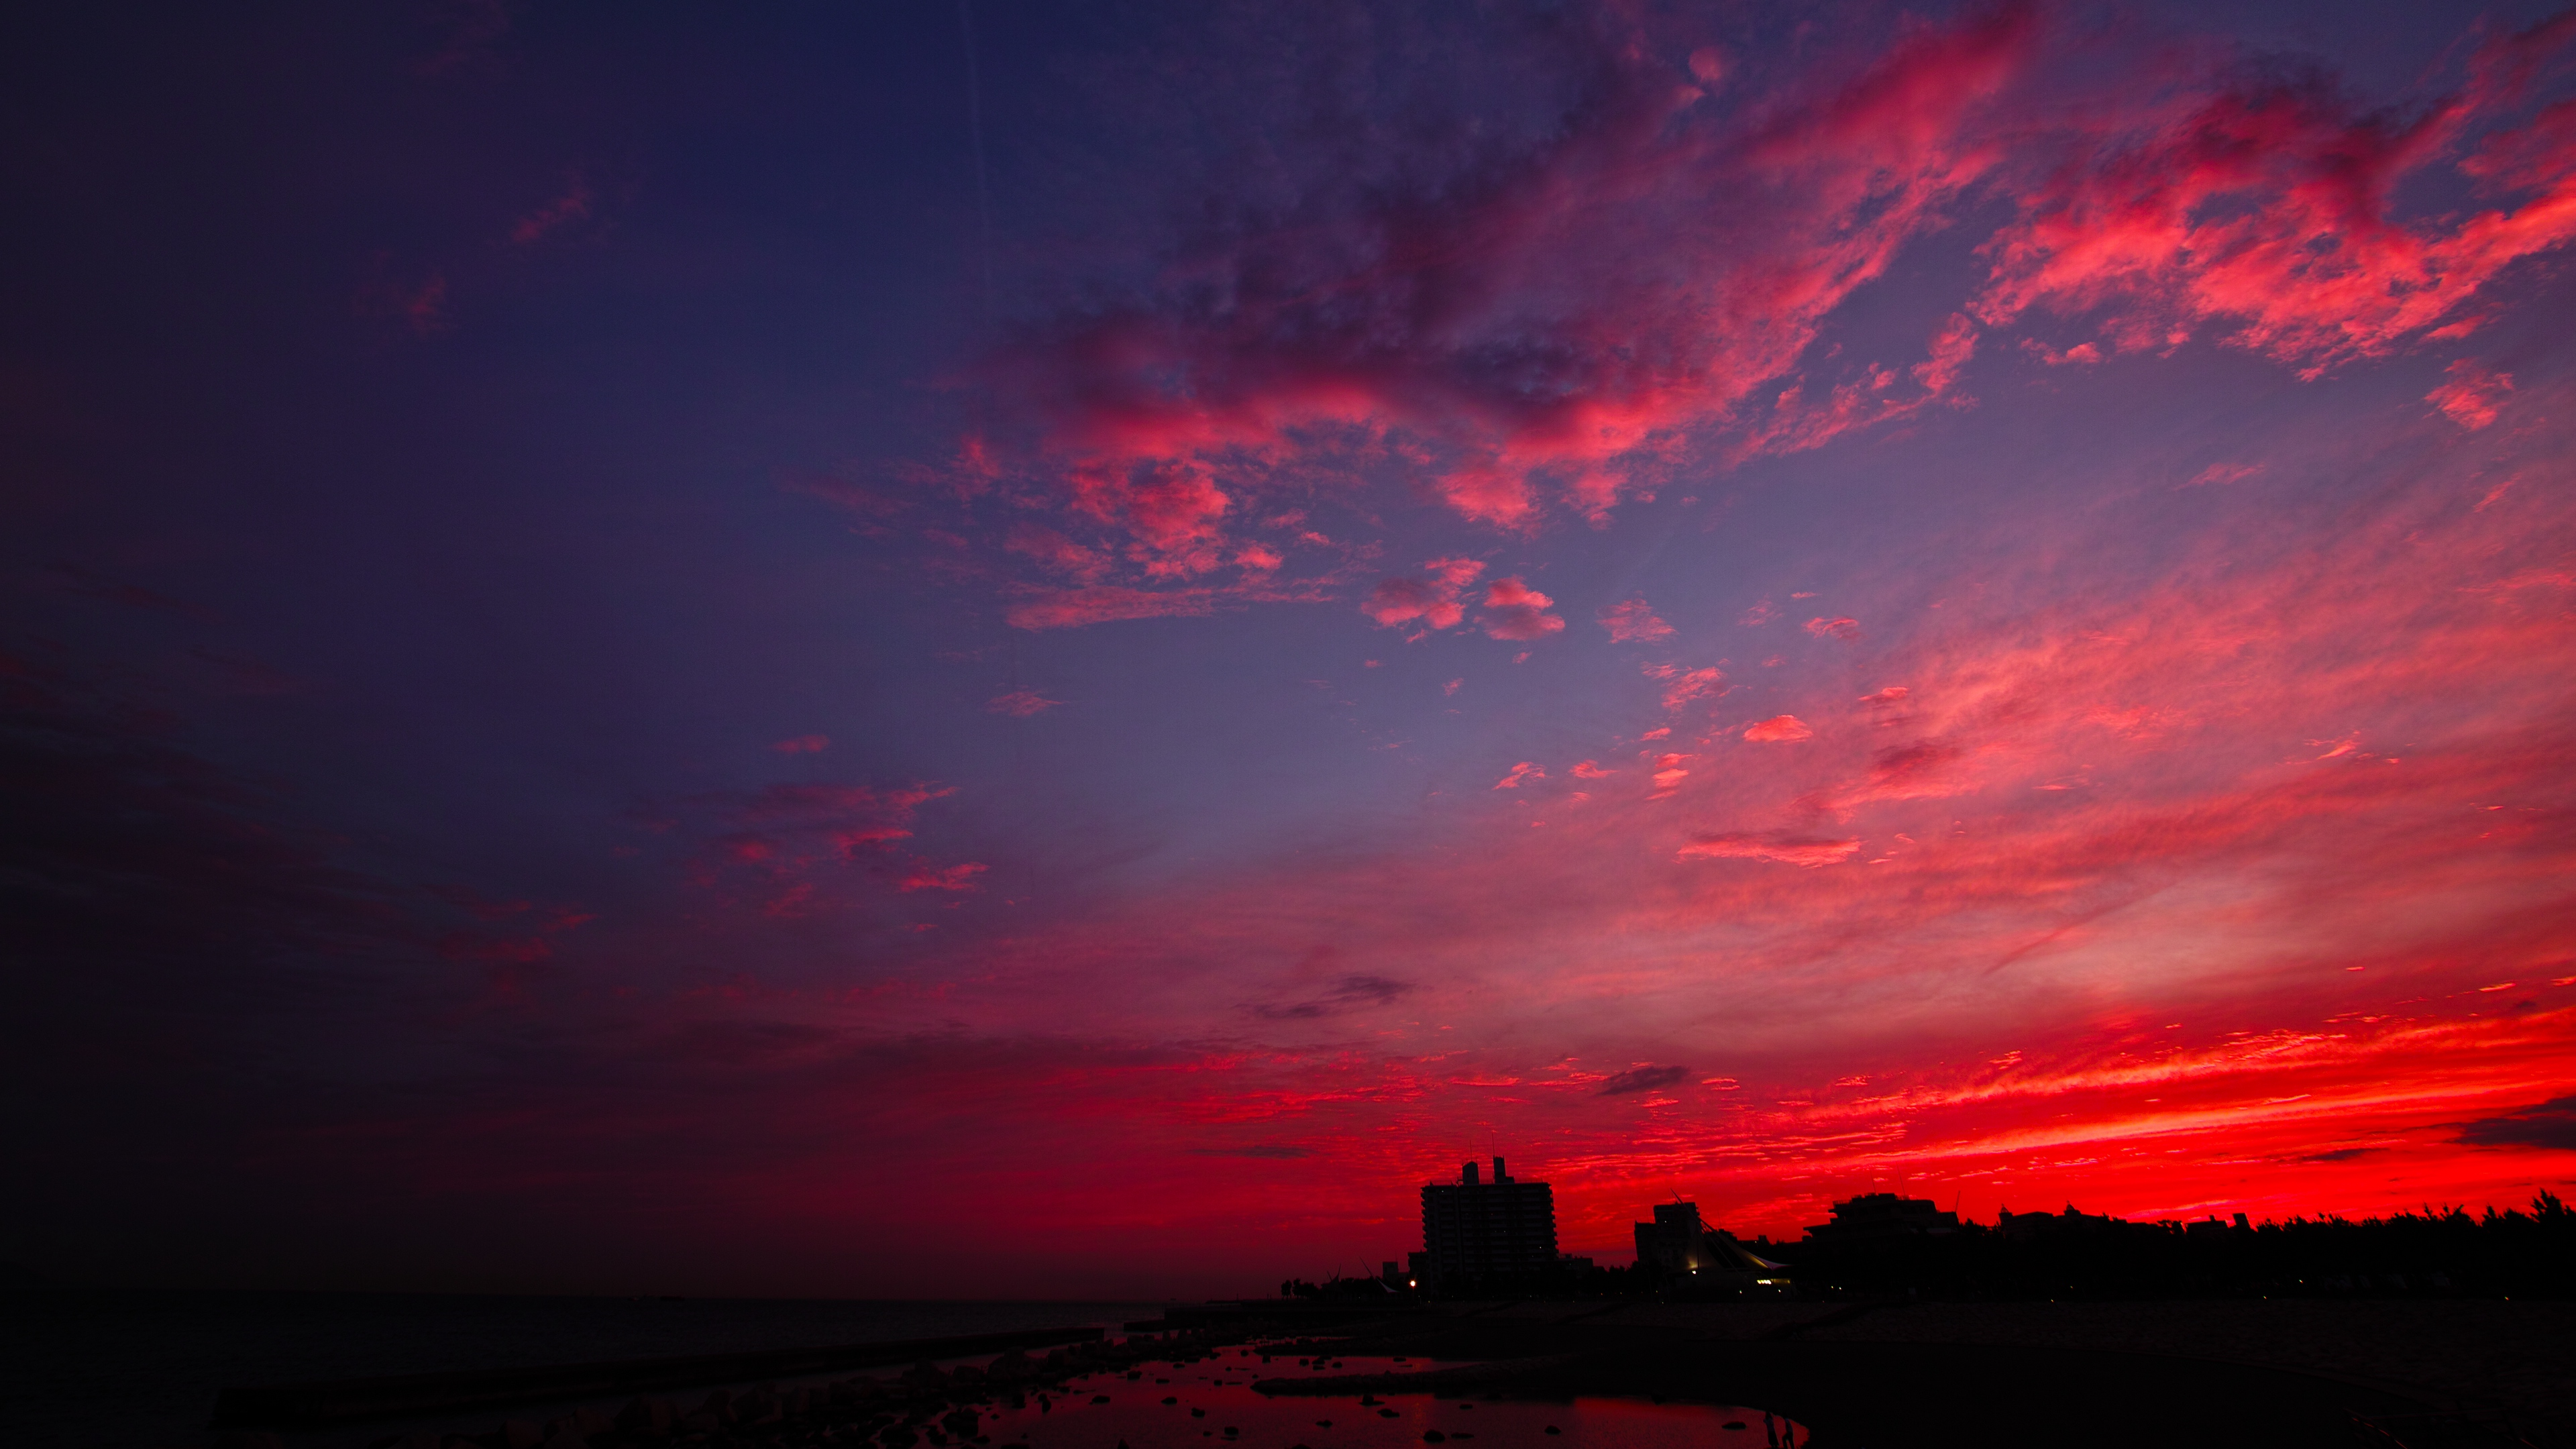 sunset night city sky clouds 4k 1538066297 - sunset, night city, sky, clouds 4k - sunset, Sky, night city